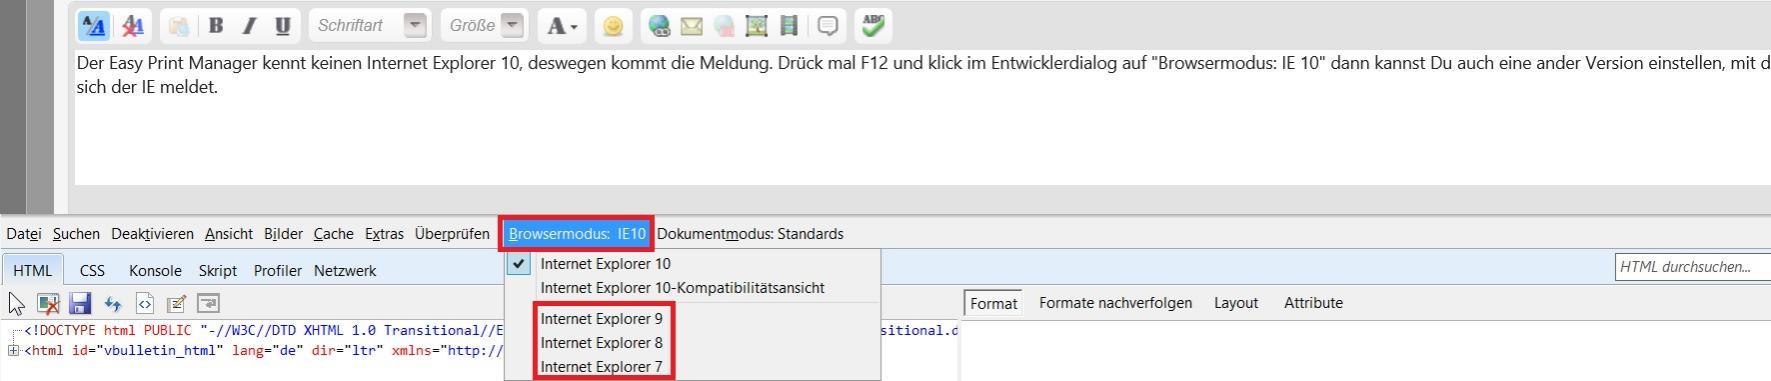 Windows 8 + Samsung Easy Print Manager...?-unbenannt.jpg